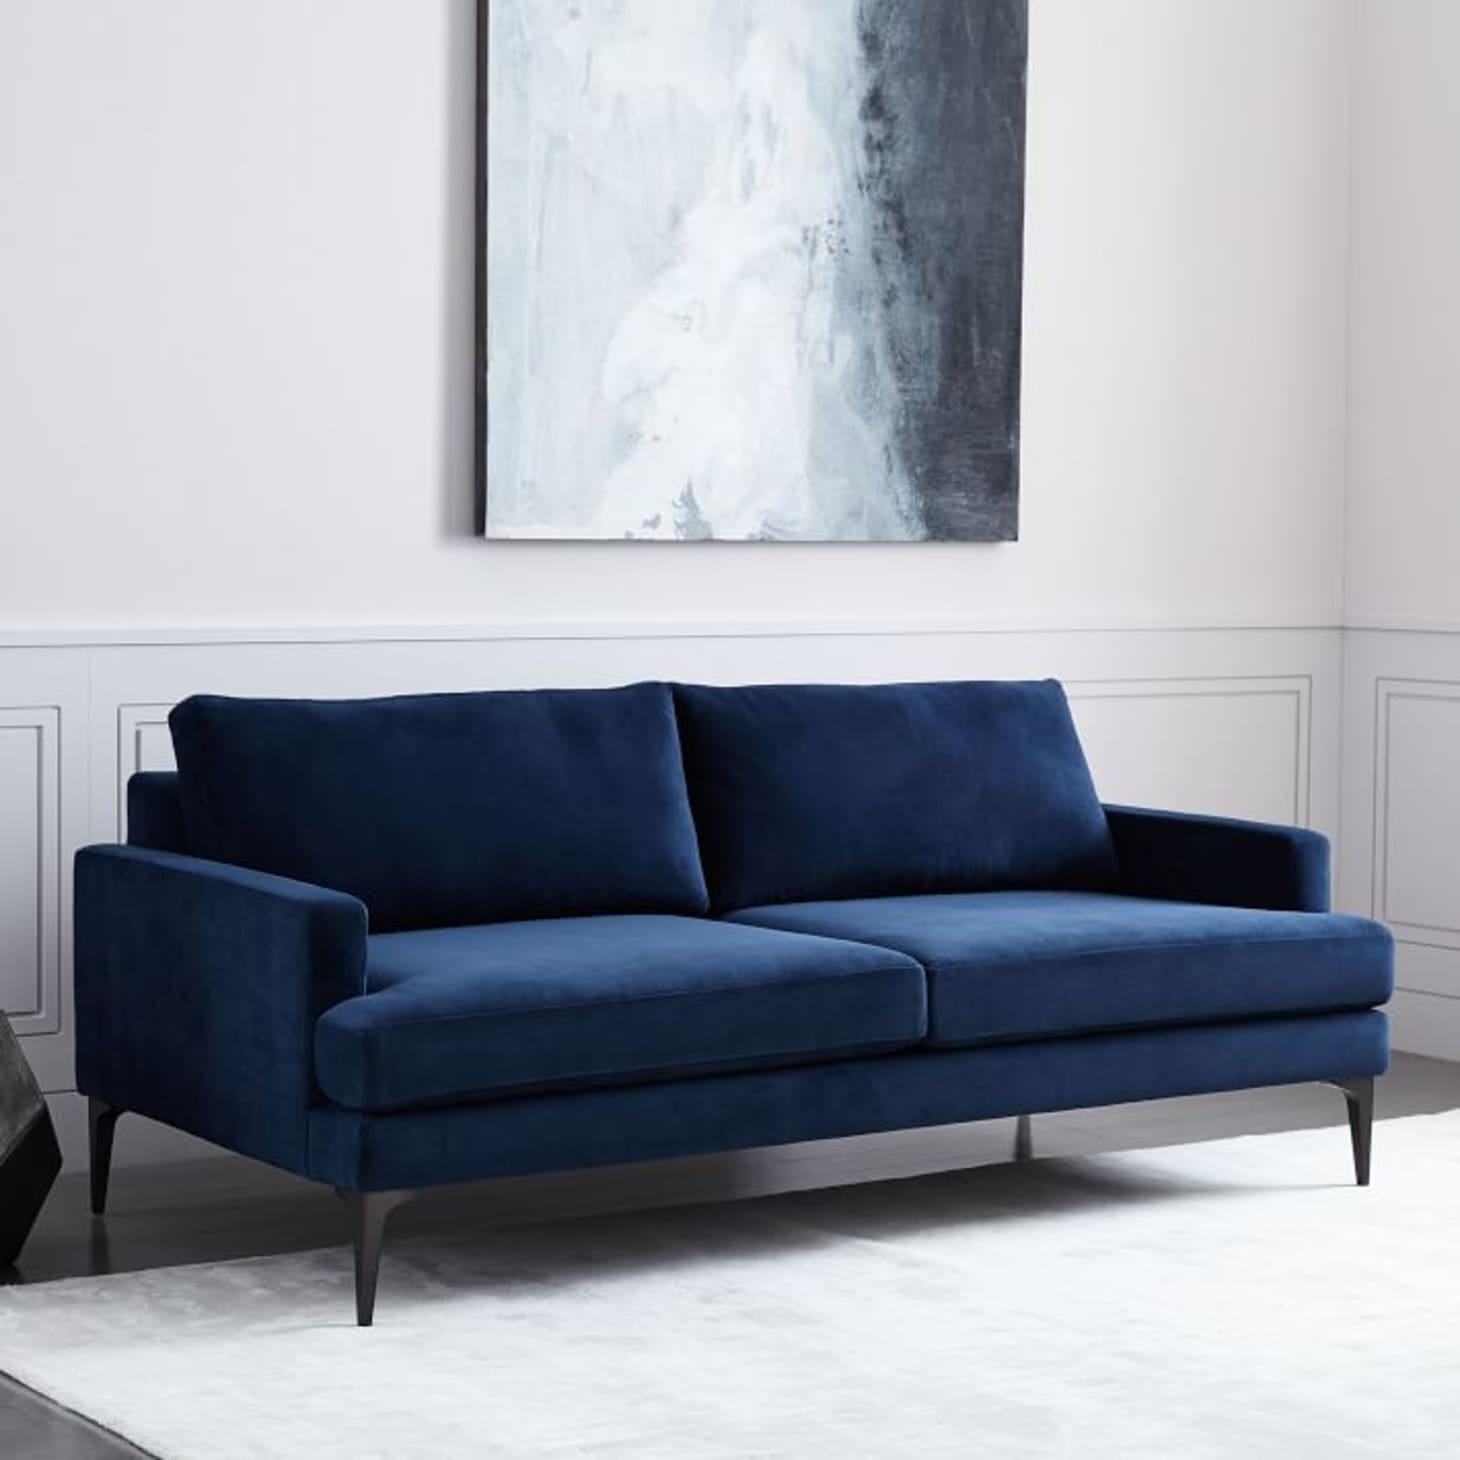 Pleasing West Elm Sale Best Couches Under 1000 Dollars Apartment Machost Co Dining Chair Design Ideas Machostcouk